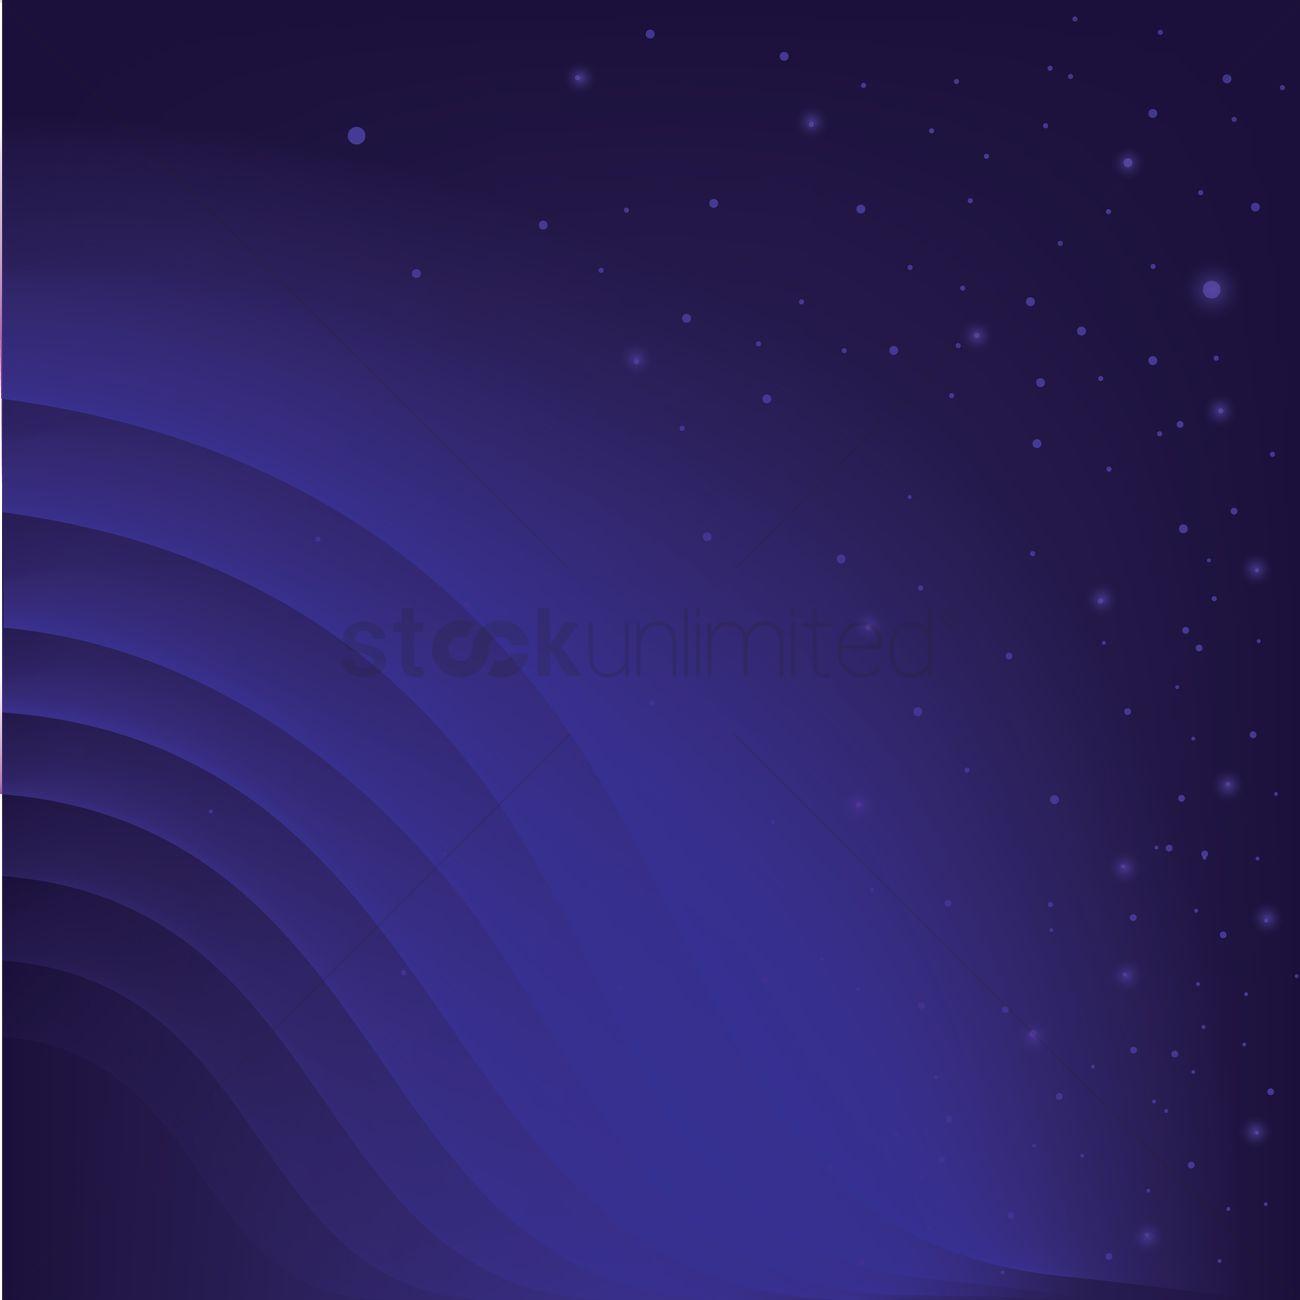 Dark blue background Vector Image - 1993187 | StockUnlimited